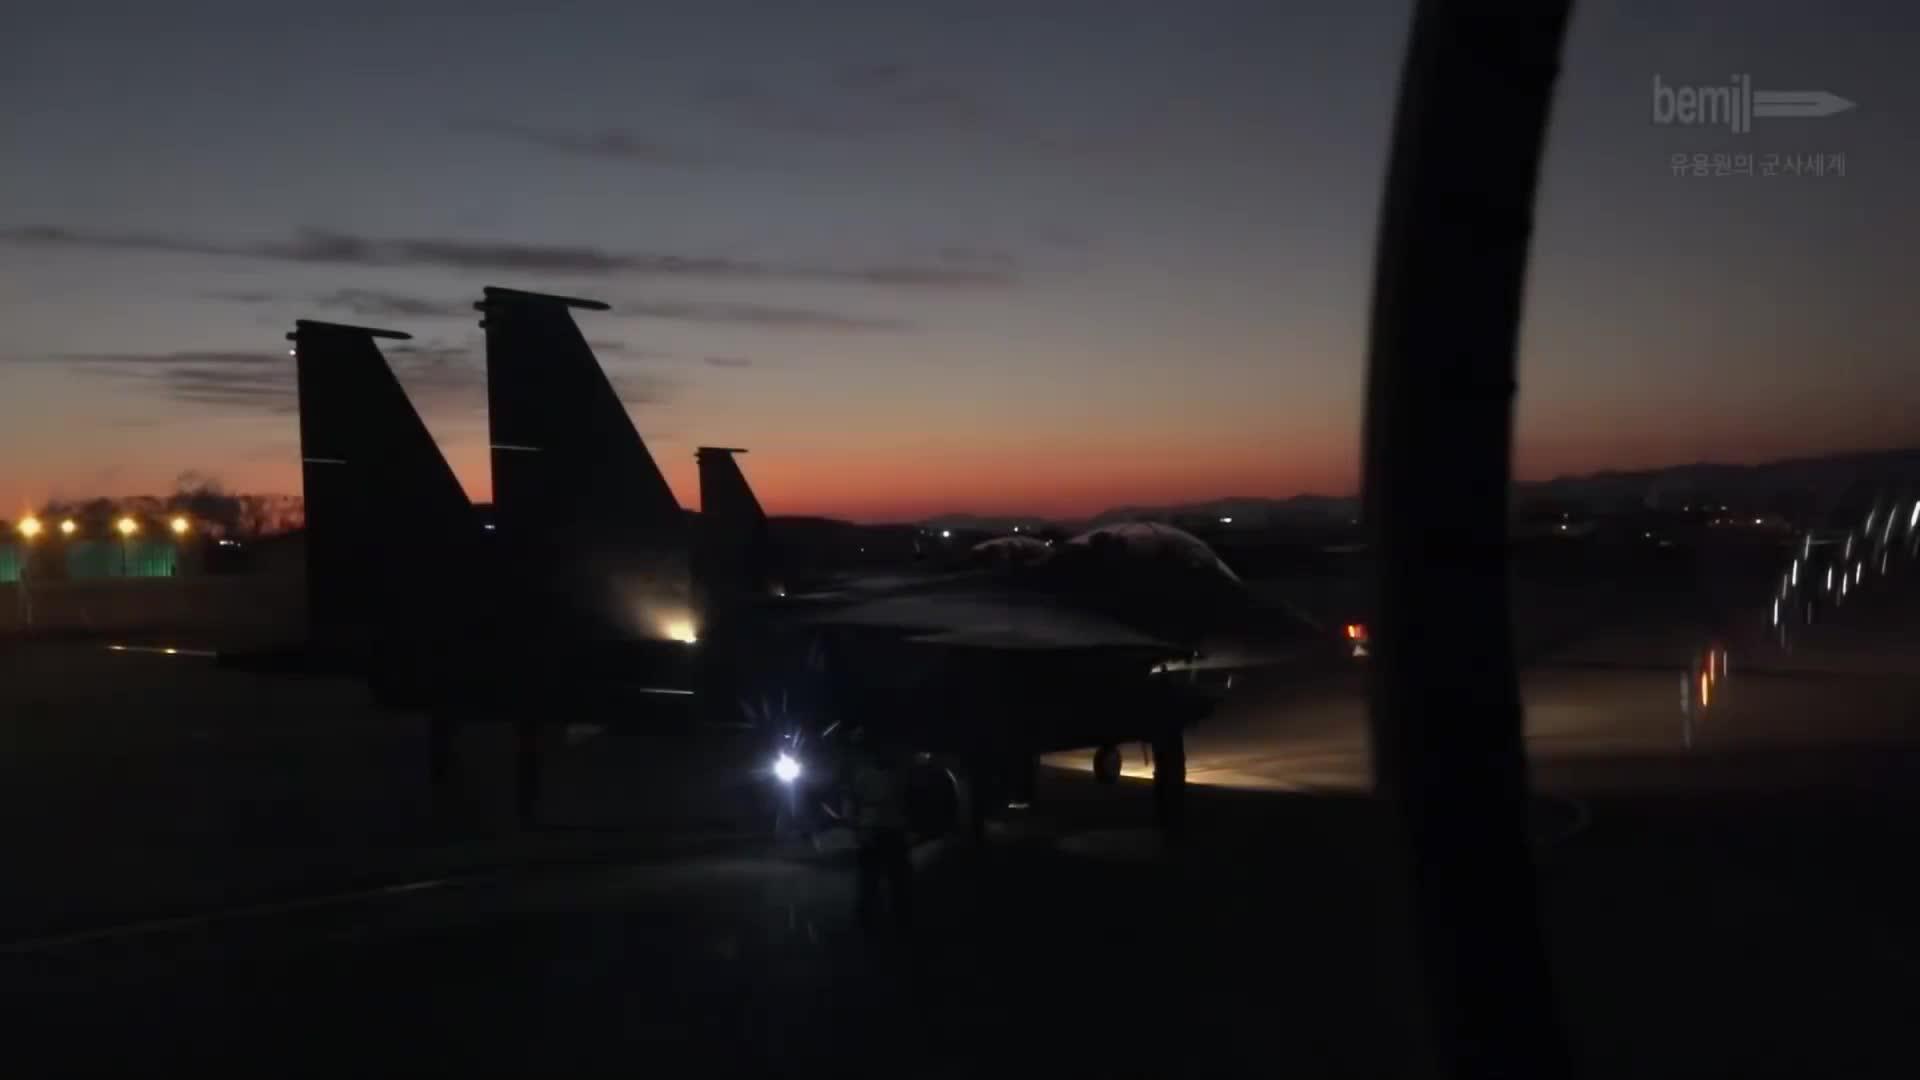 korea, military, militarygfys, new year, south korea, ROKAF 2019 New Year Flight GIFs